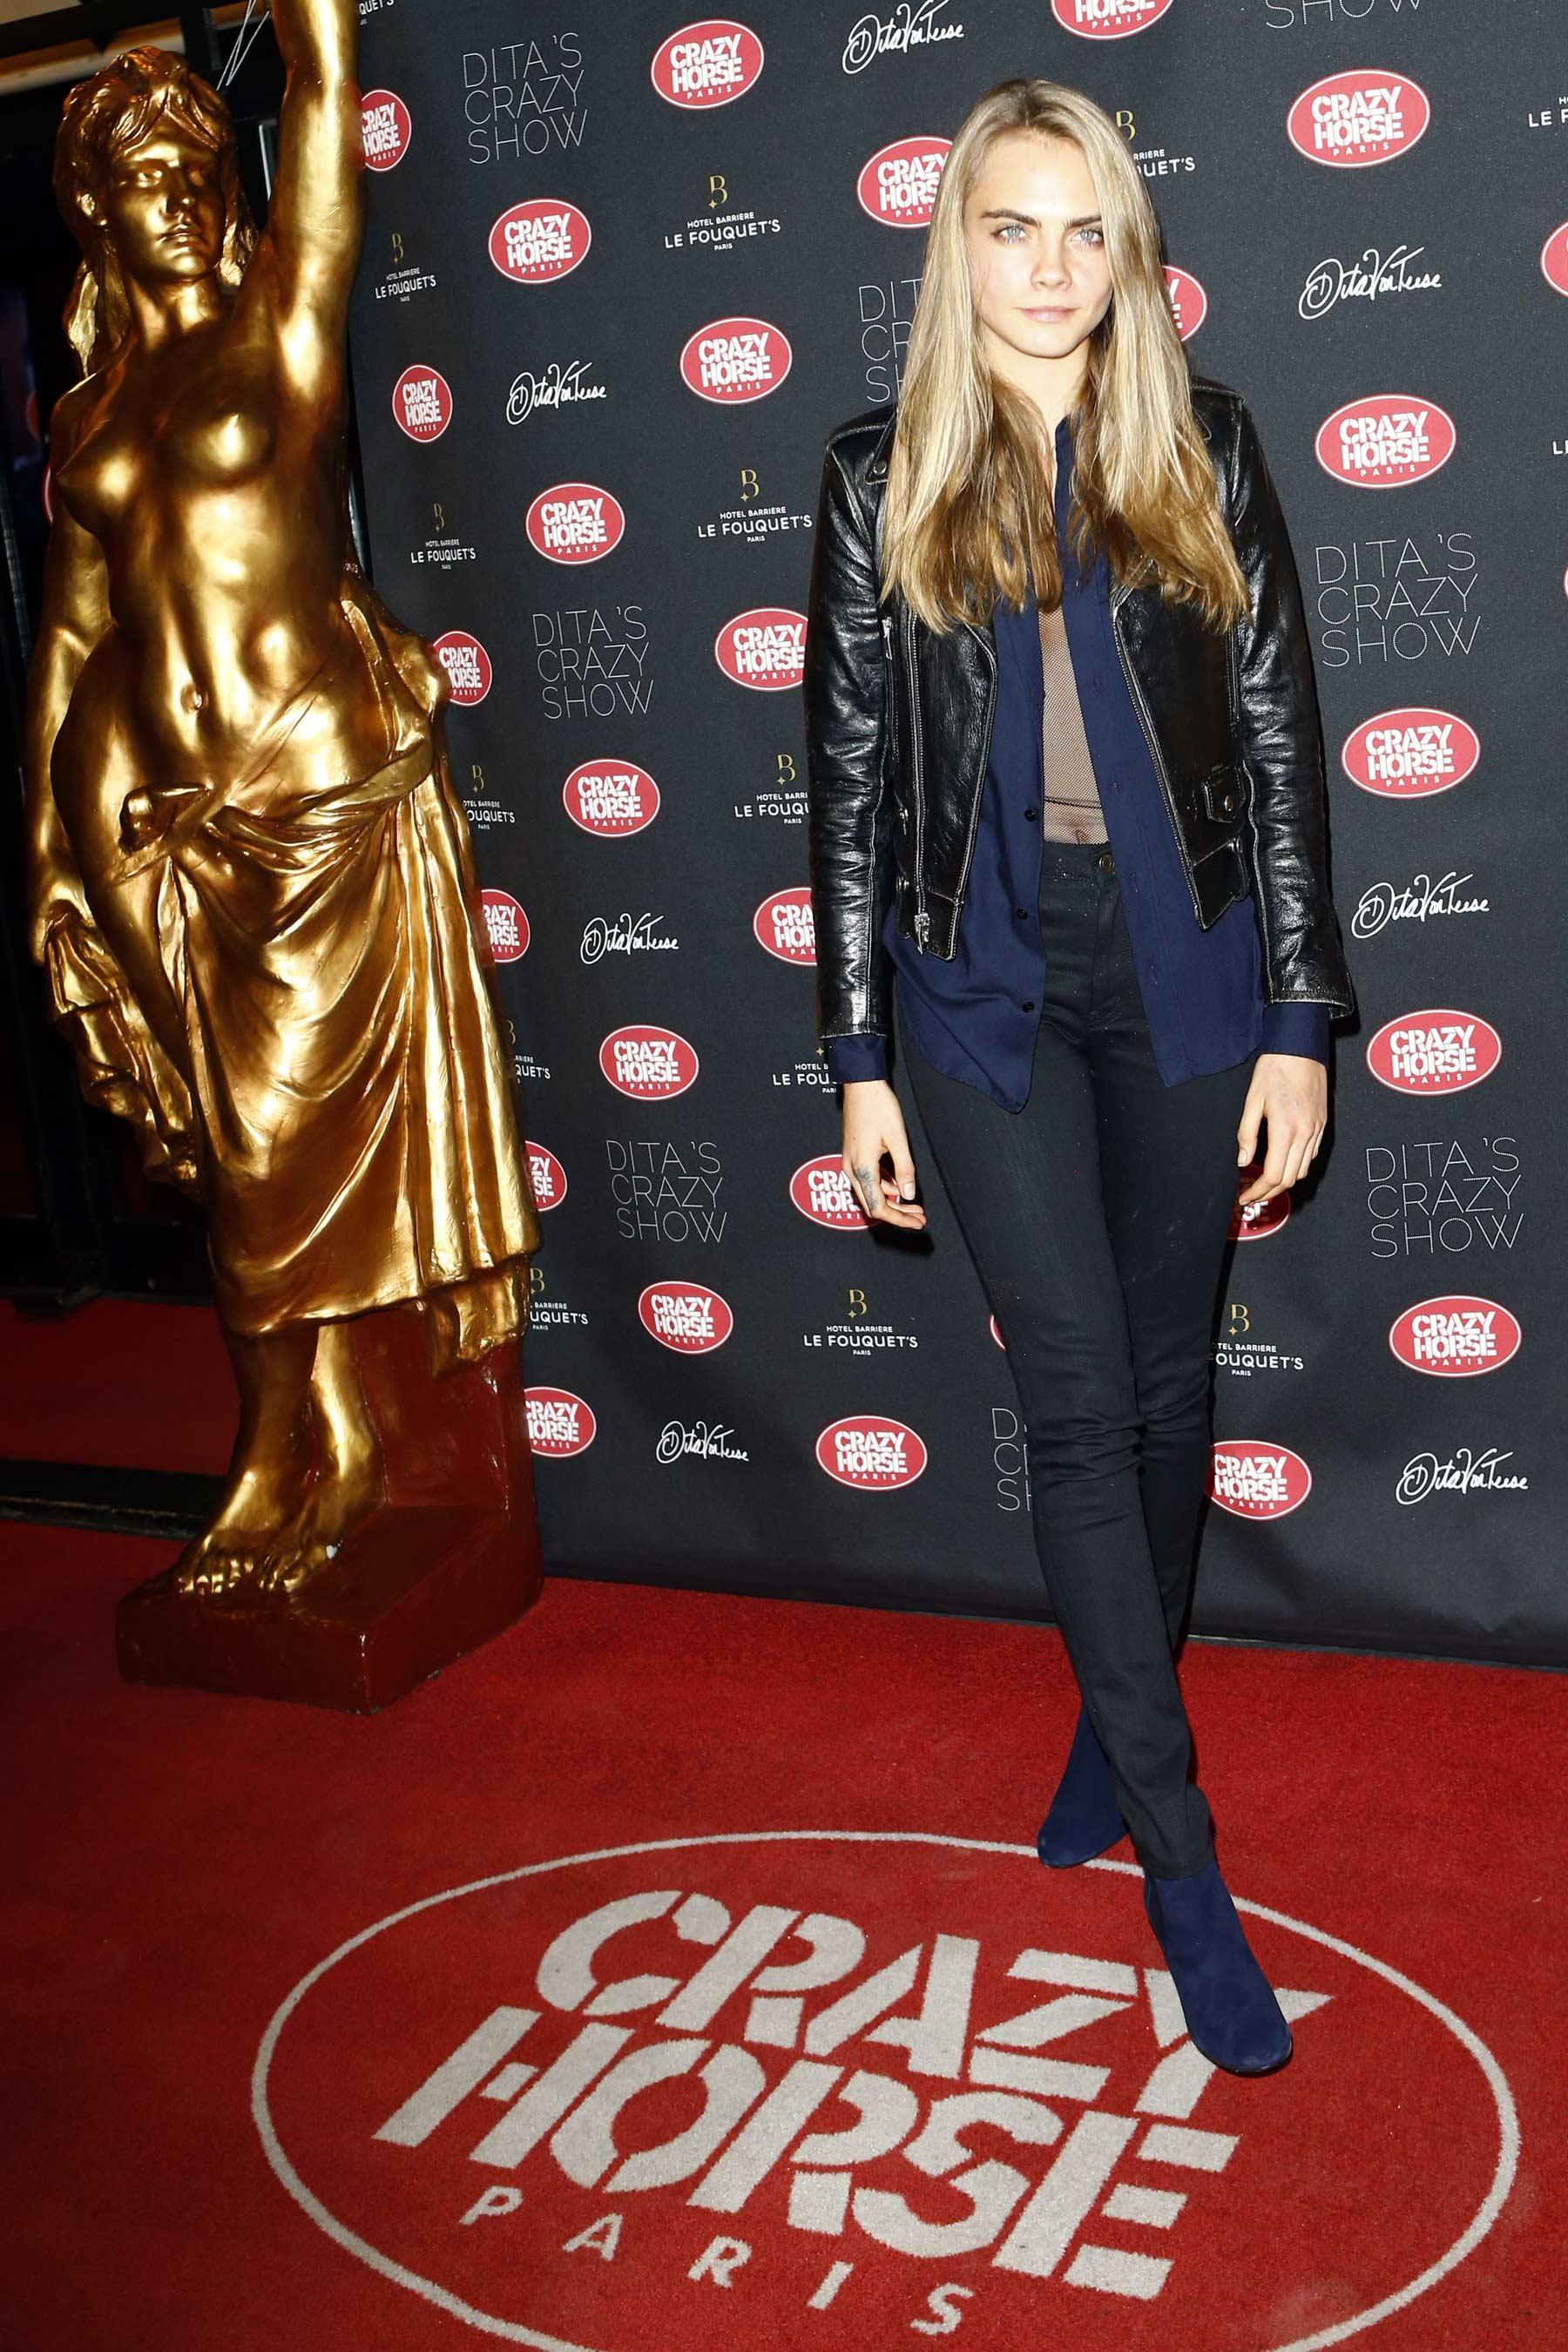 Cara Delevingne attends Dita Von Teese's Crazy Show